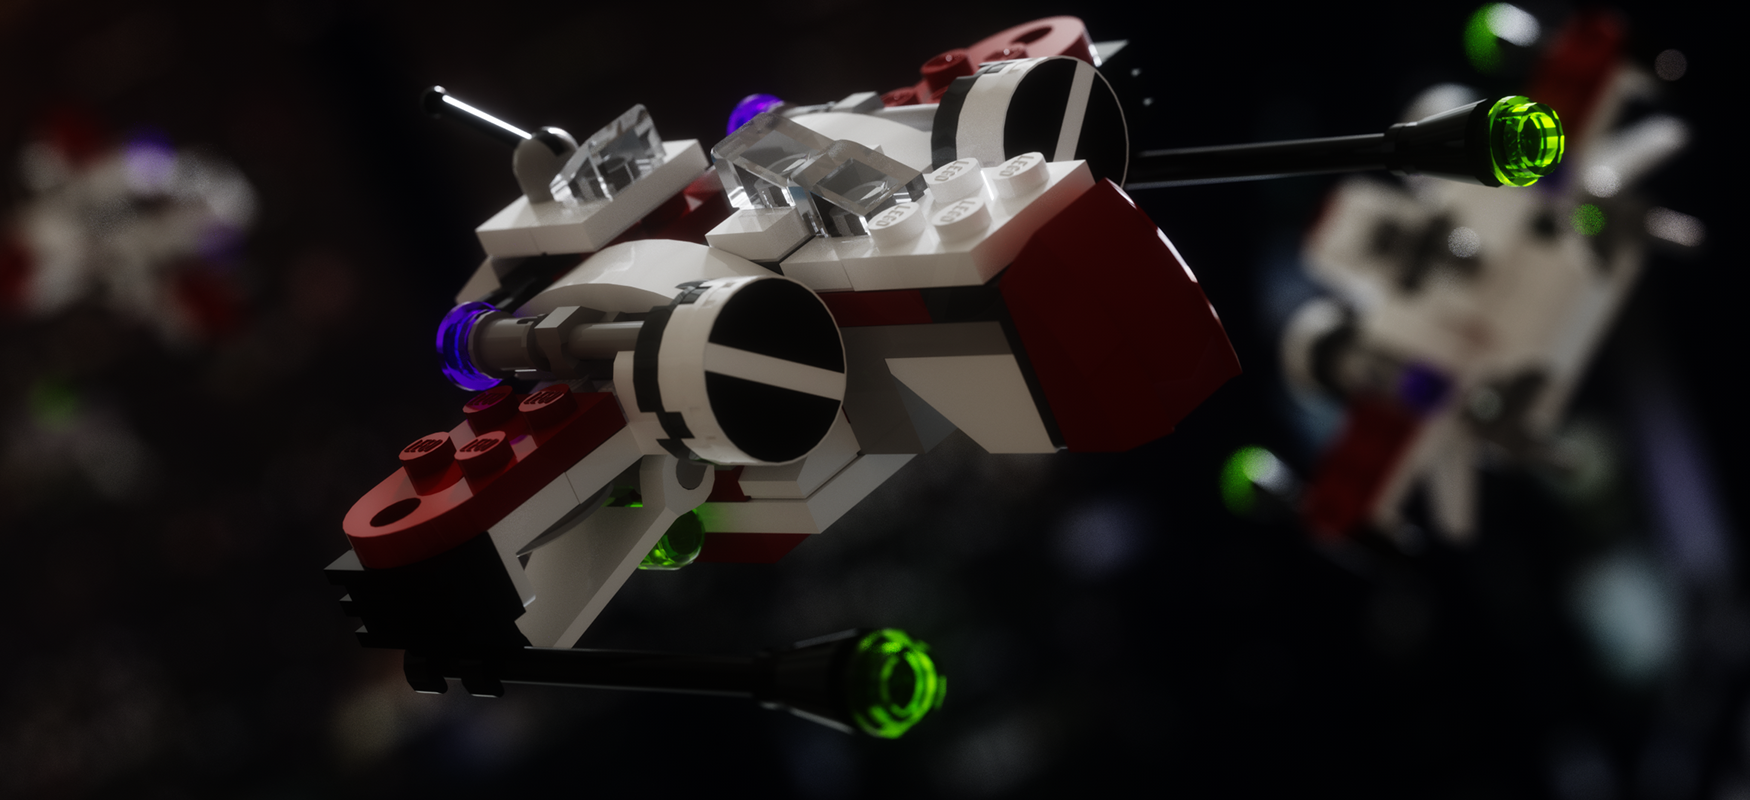 Project Lego Mini ARC-170 Starfighter